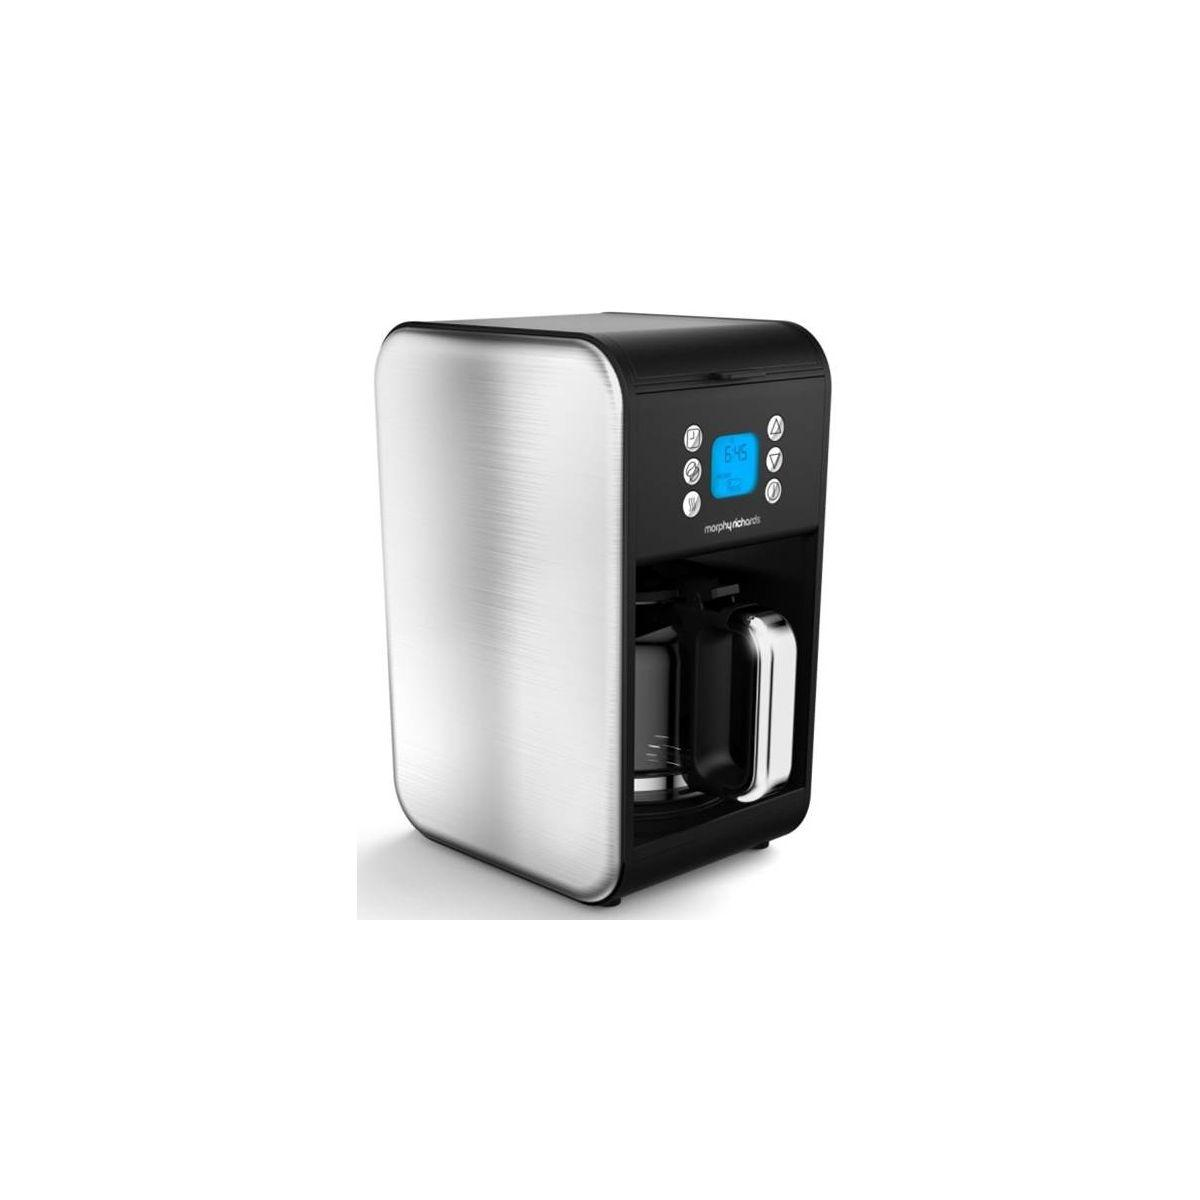 Cafeti�re programmable morphy richards accents refresh inox - 10% de remise imm�diate avec le code : deal10 (photo)